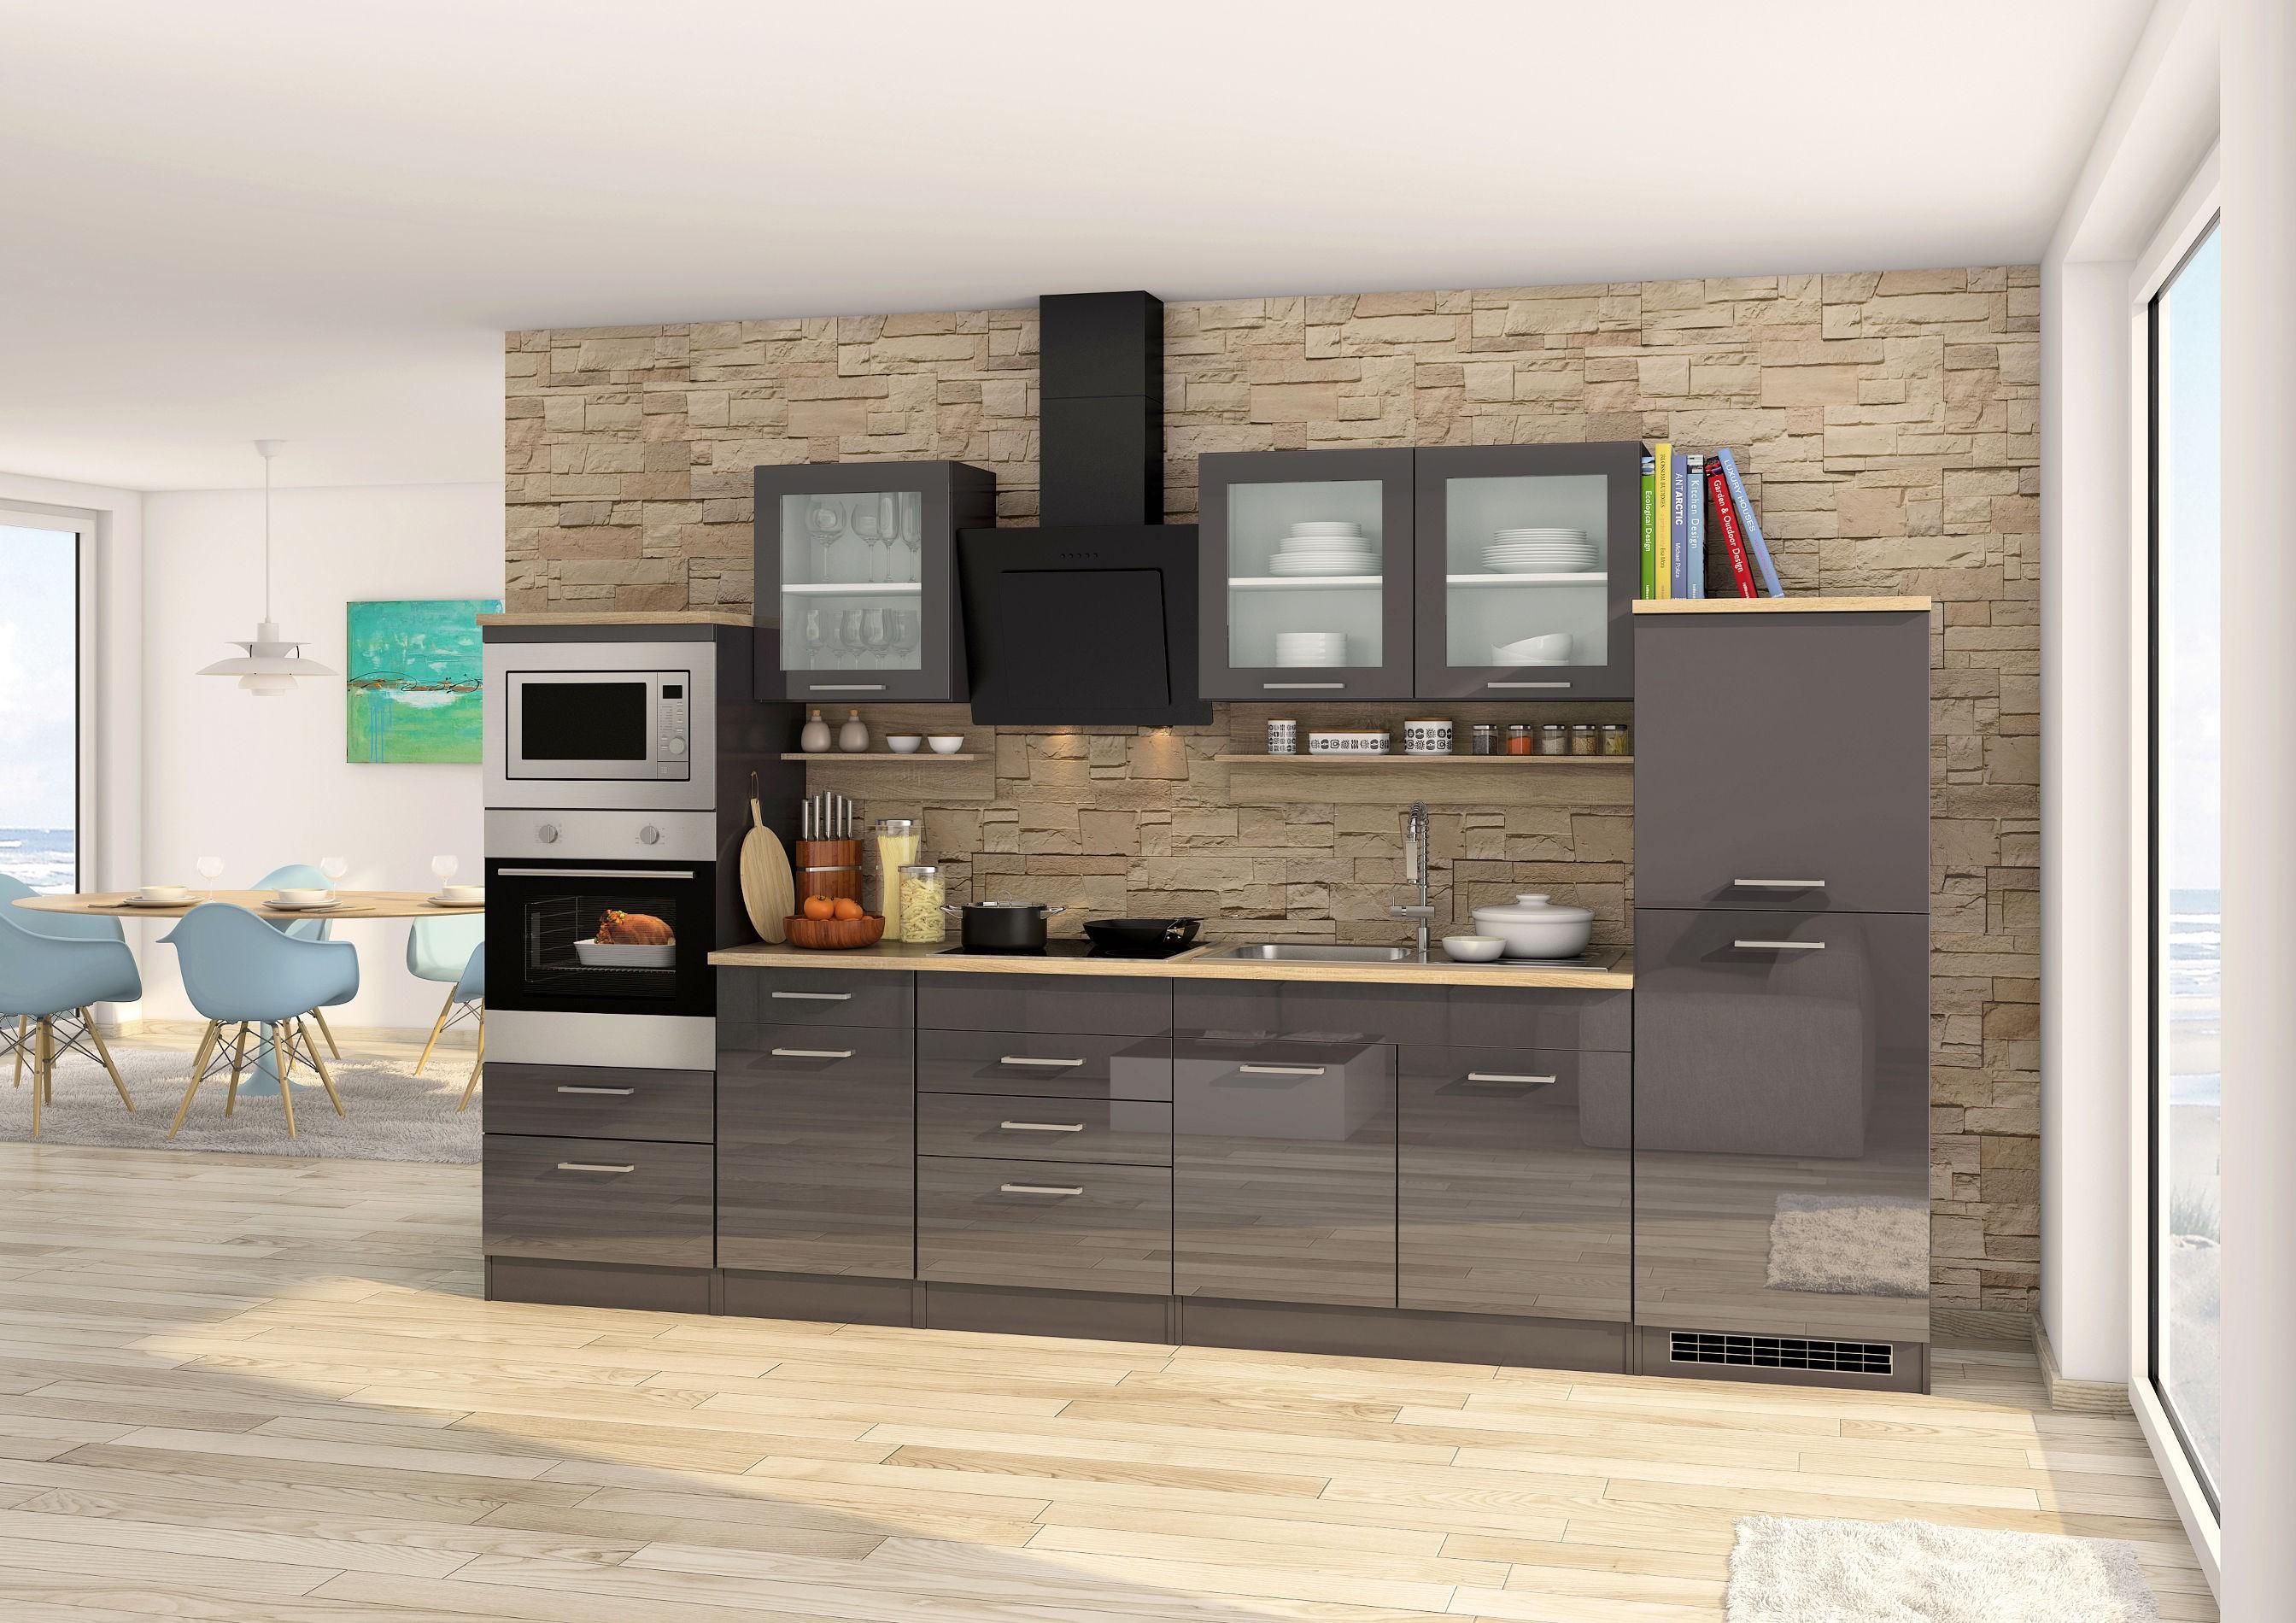 k chen wandregal m nchen k chenregal regal mit ablagefl che 50 cm eiche sonoma ebay. Black Bedroom Furniture Sets. Home Design Ideas